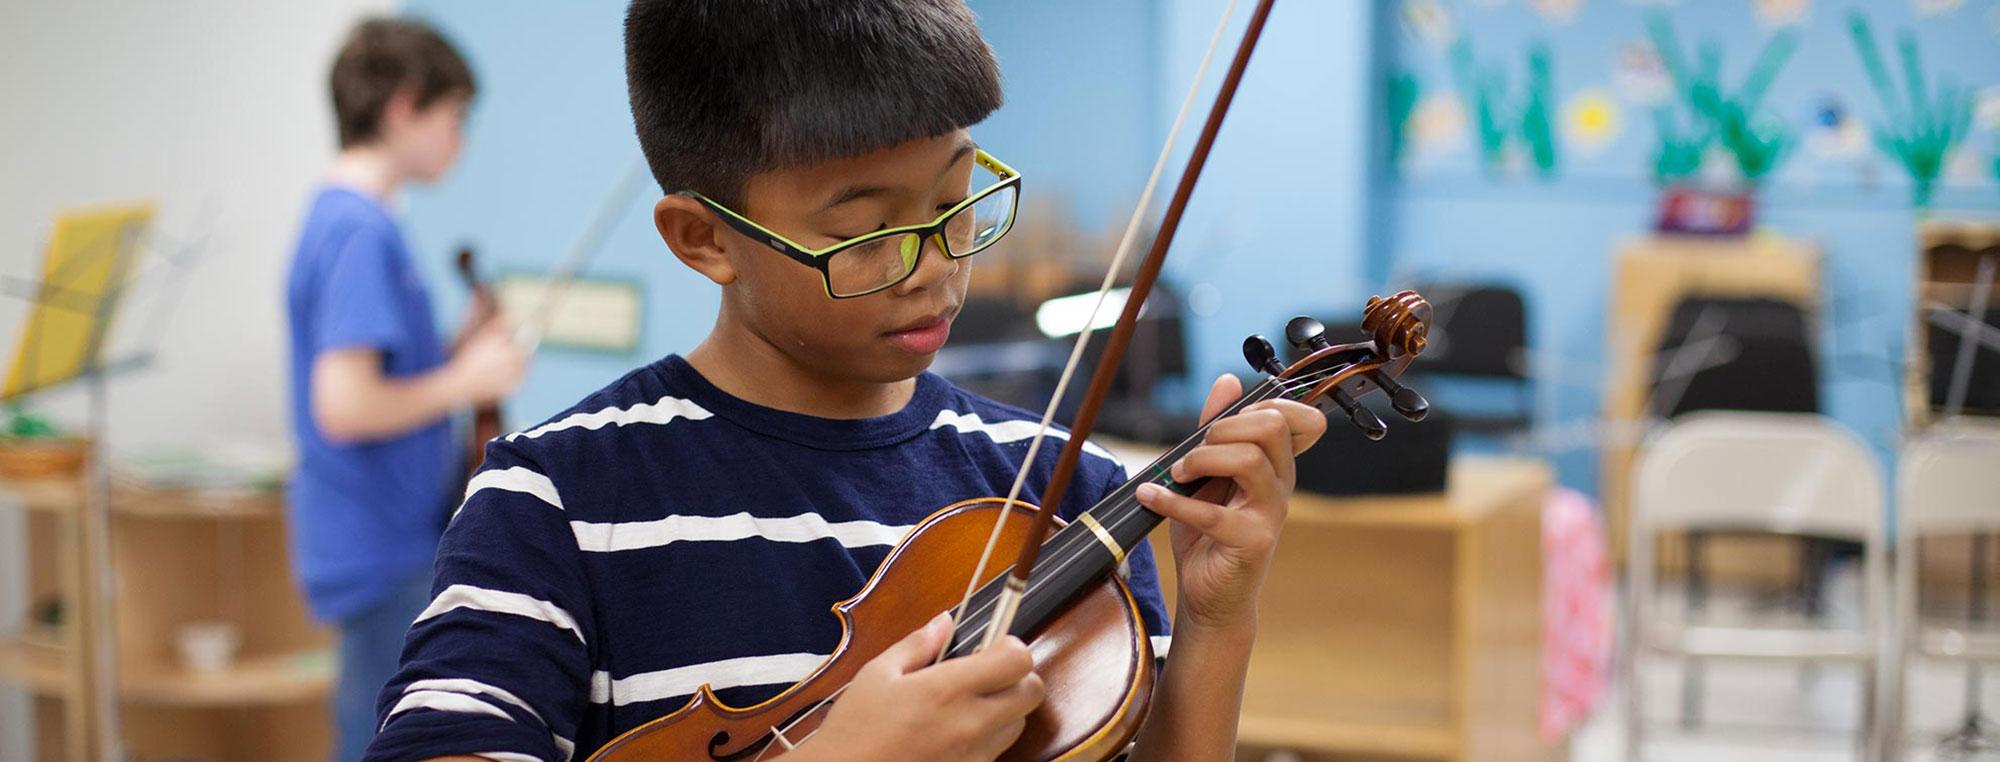 Child Strumming Violin